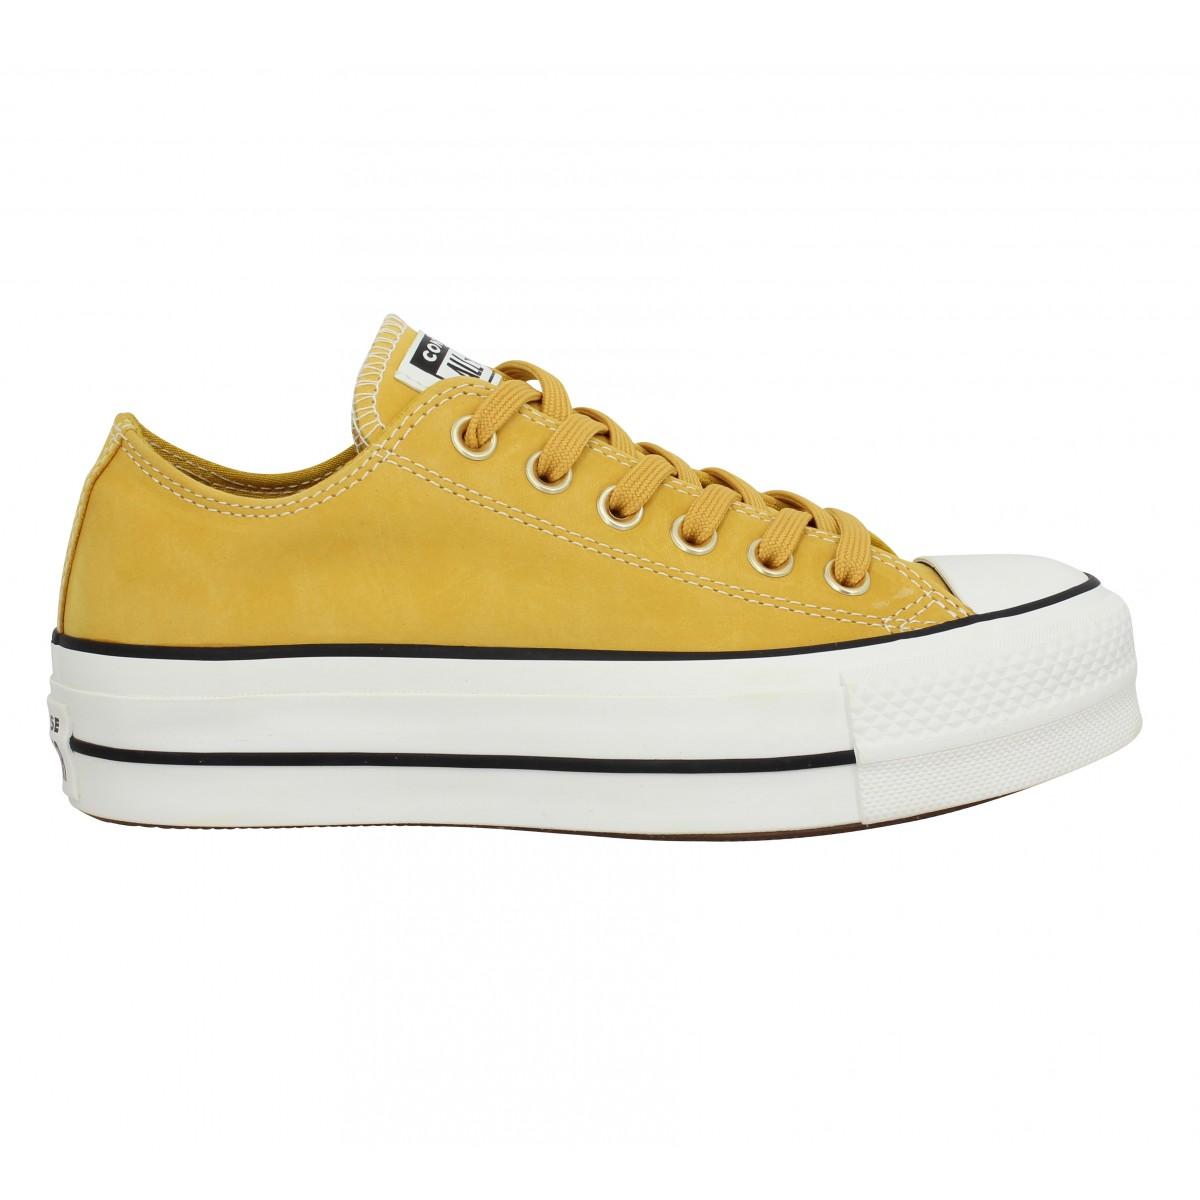 chaussure converse jaune